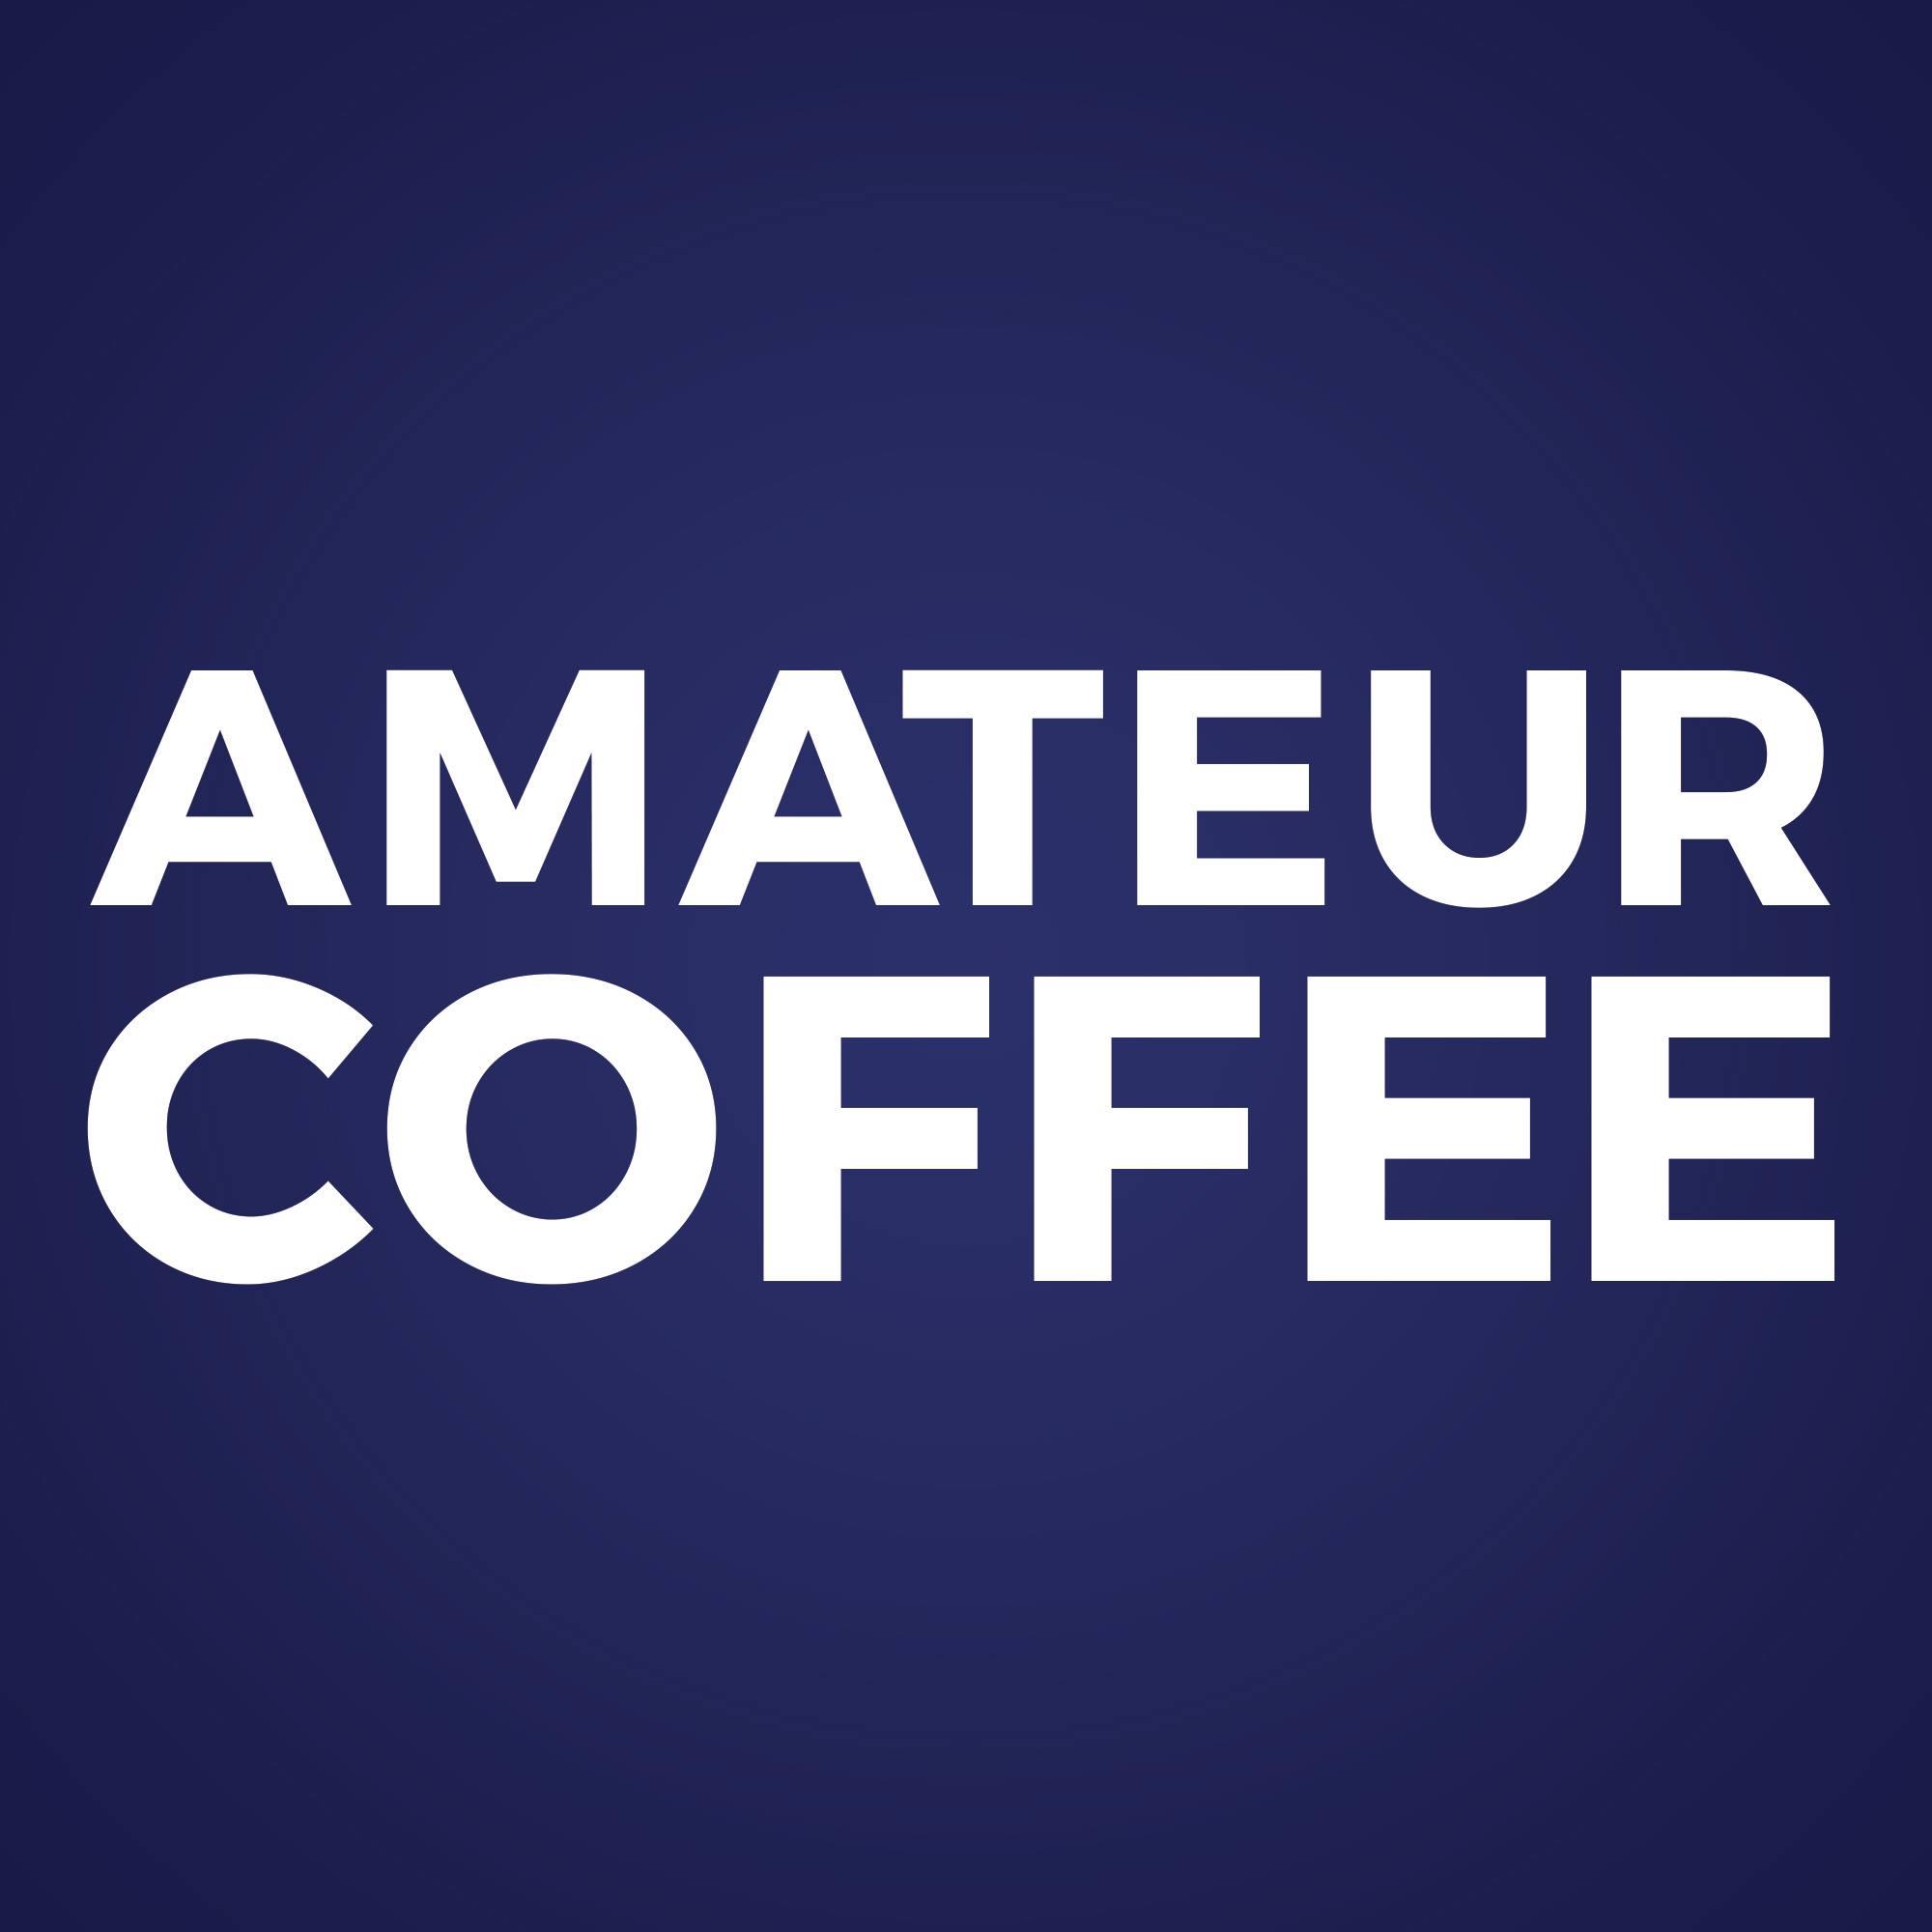 Amateur Coffee